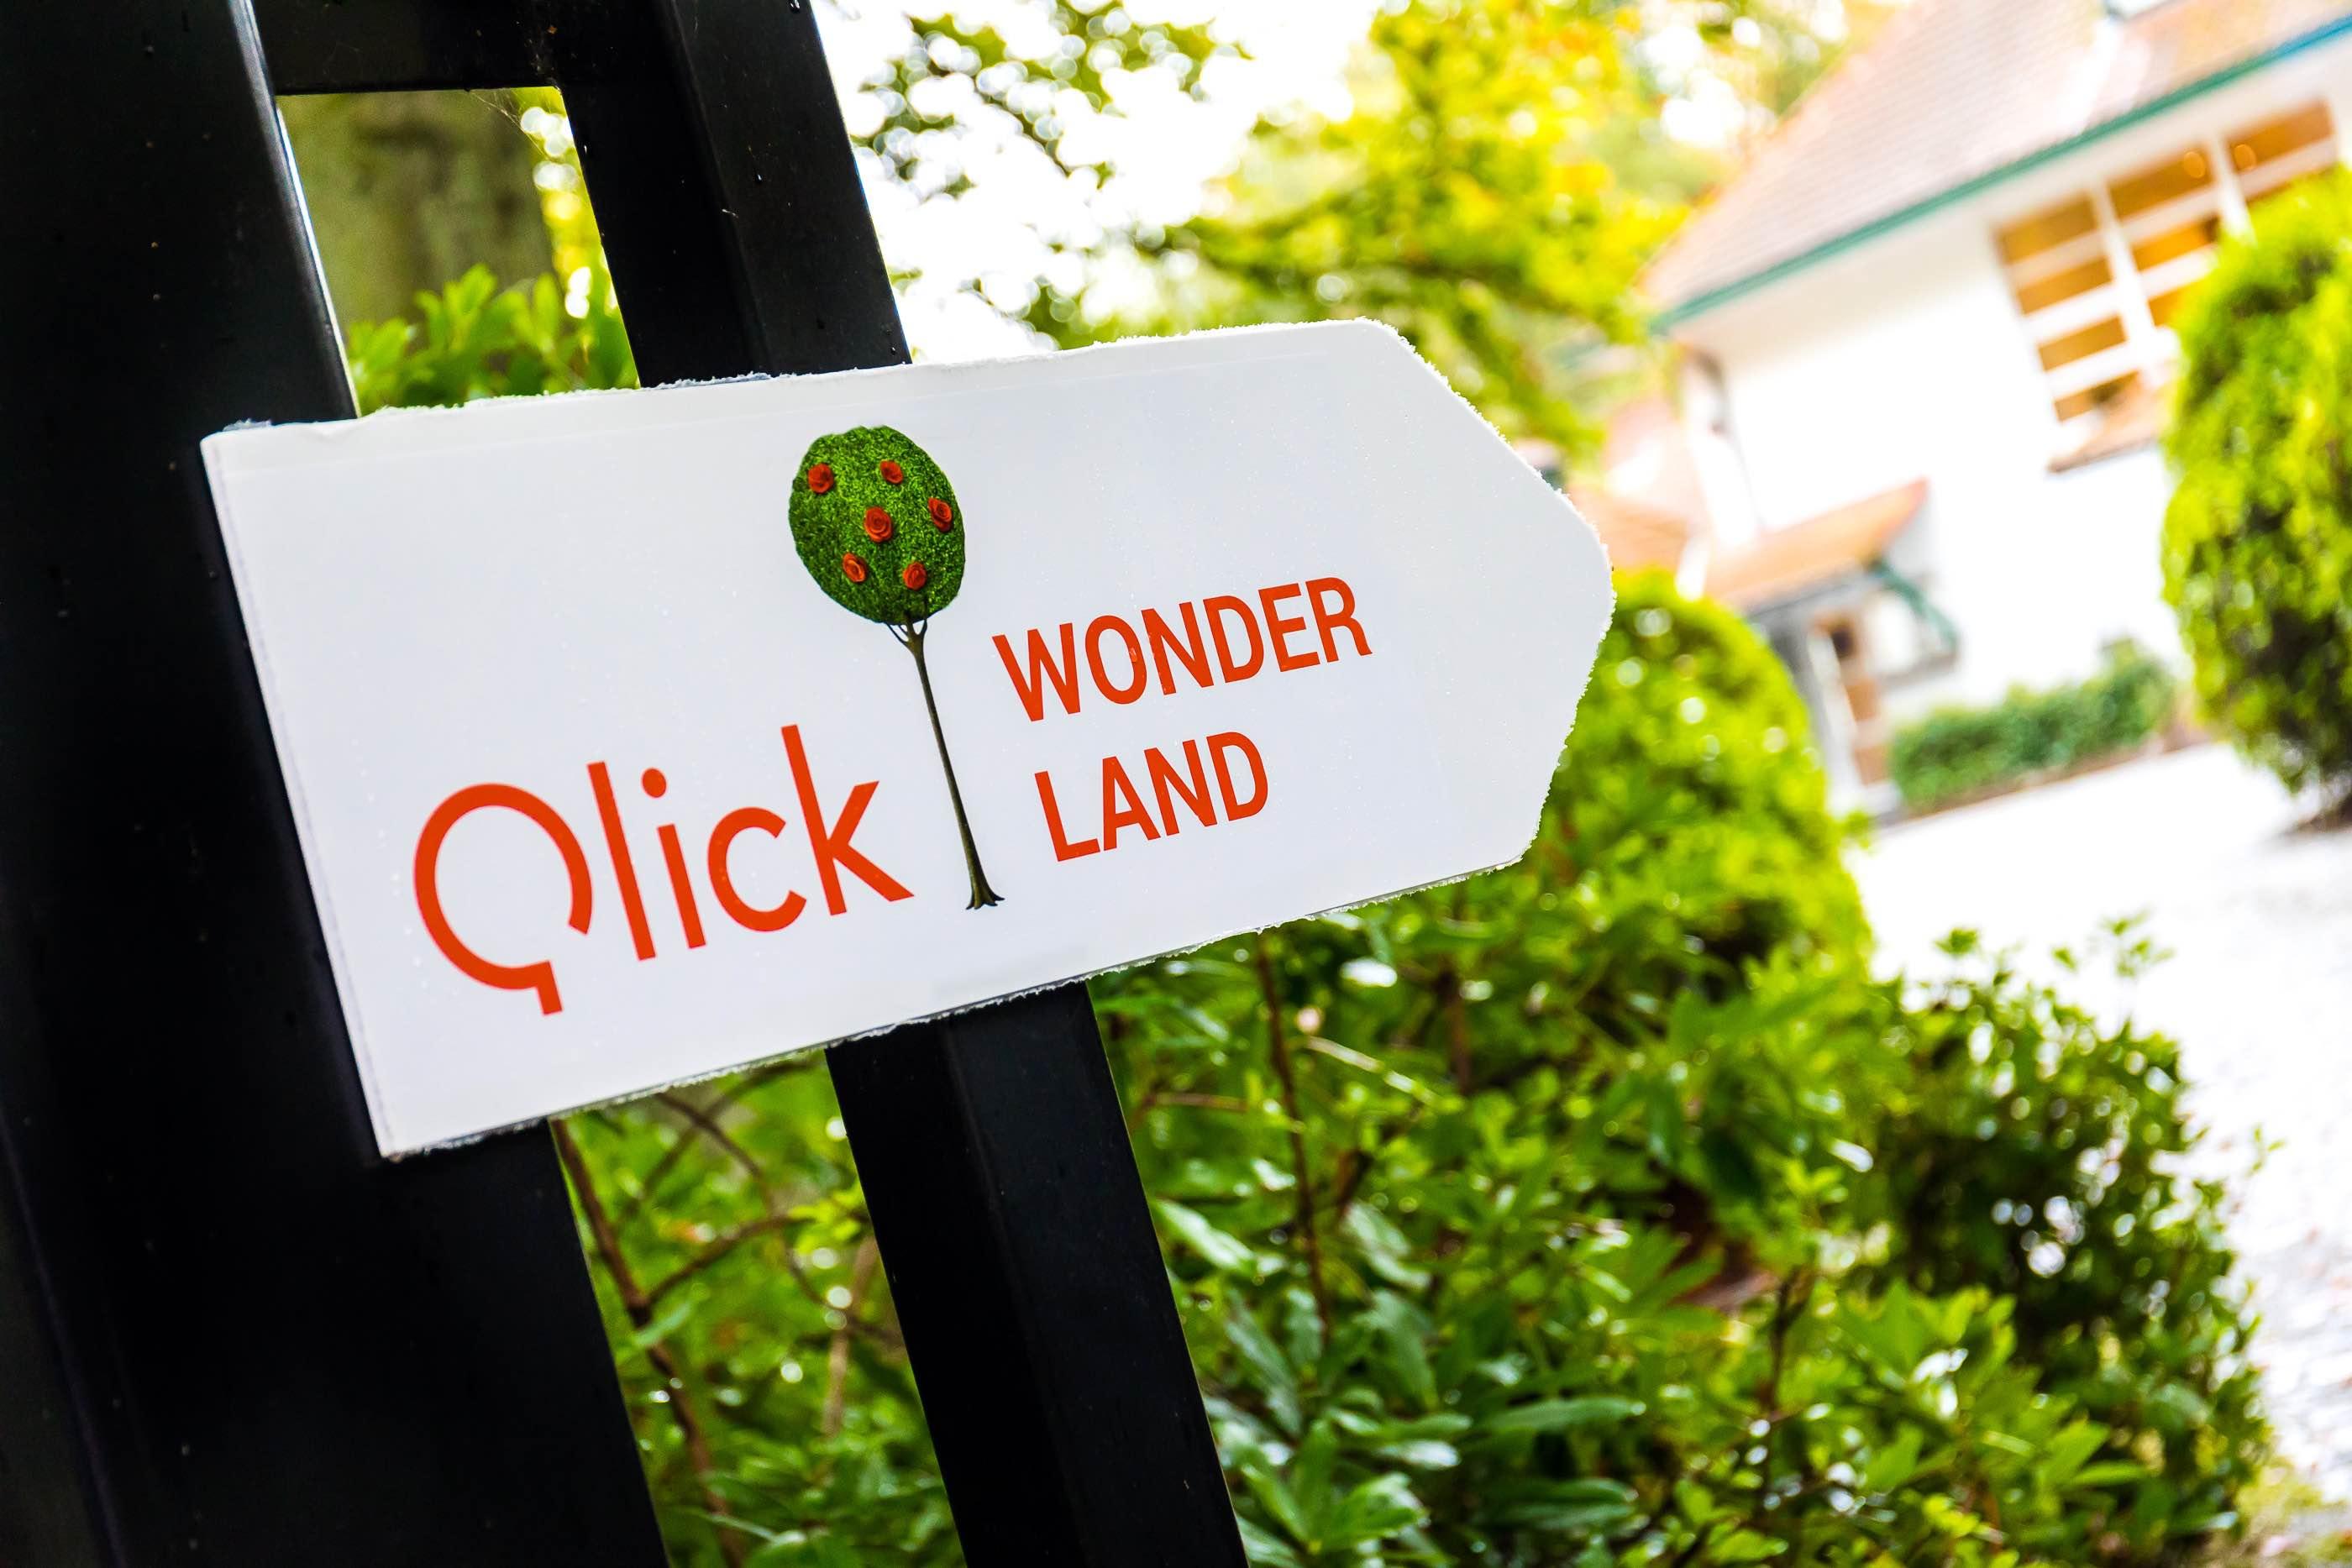 Qlick's Wonderland